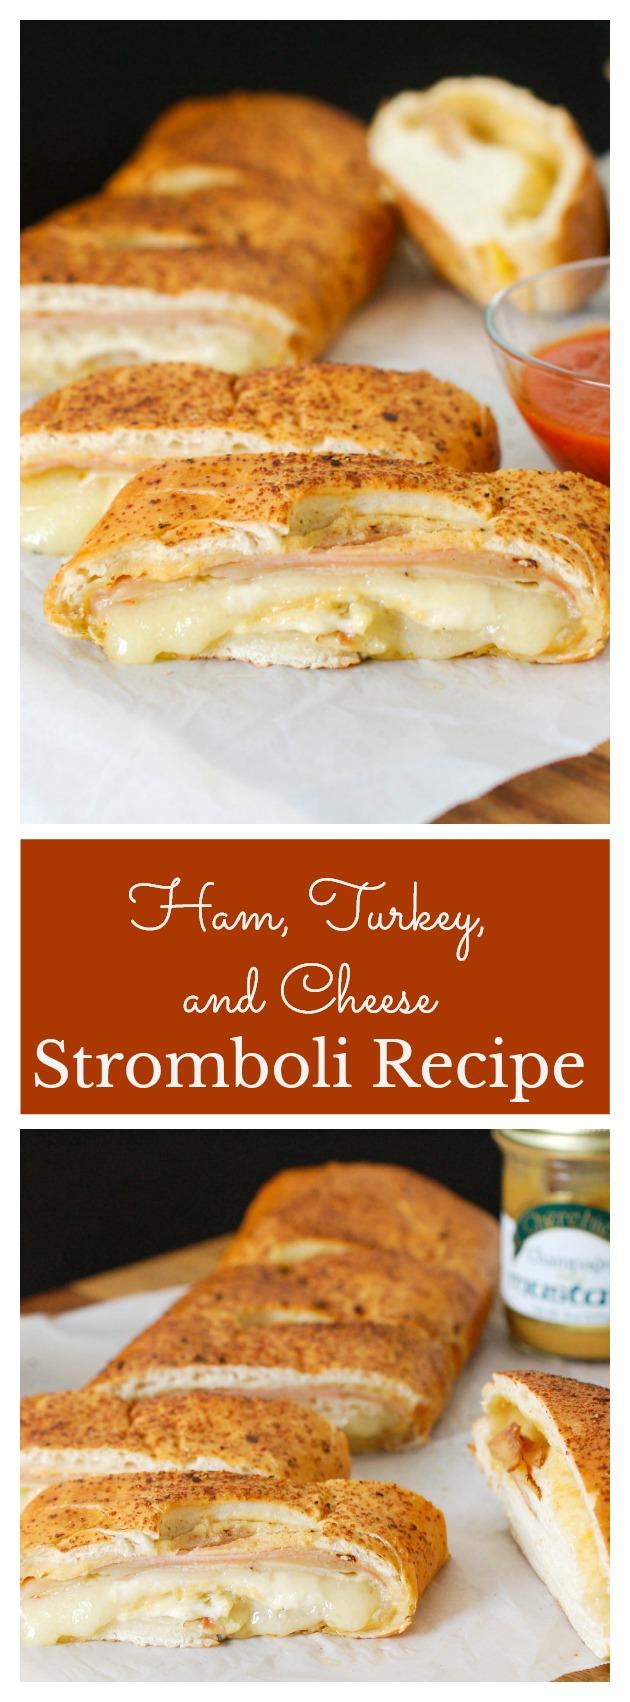 Ham, Turkey and Cheese Stromboli Recipe